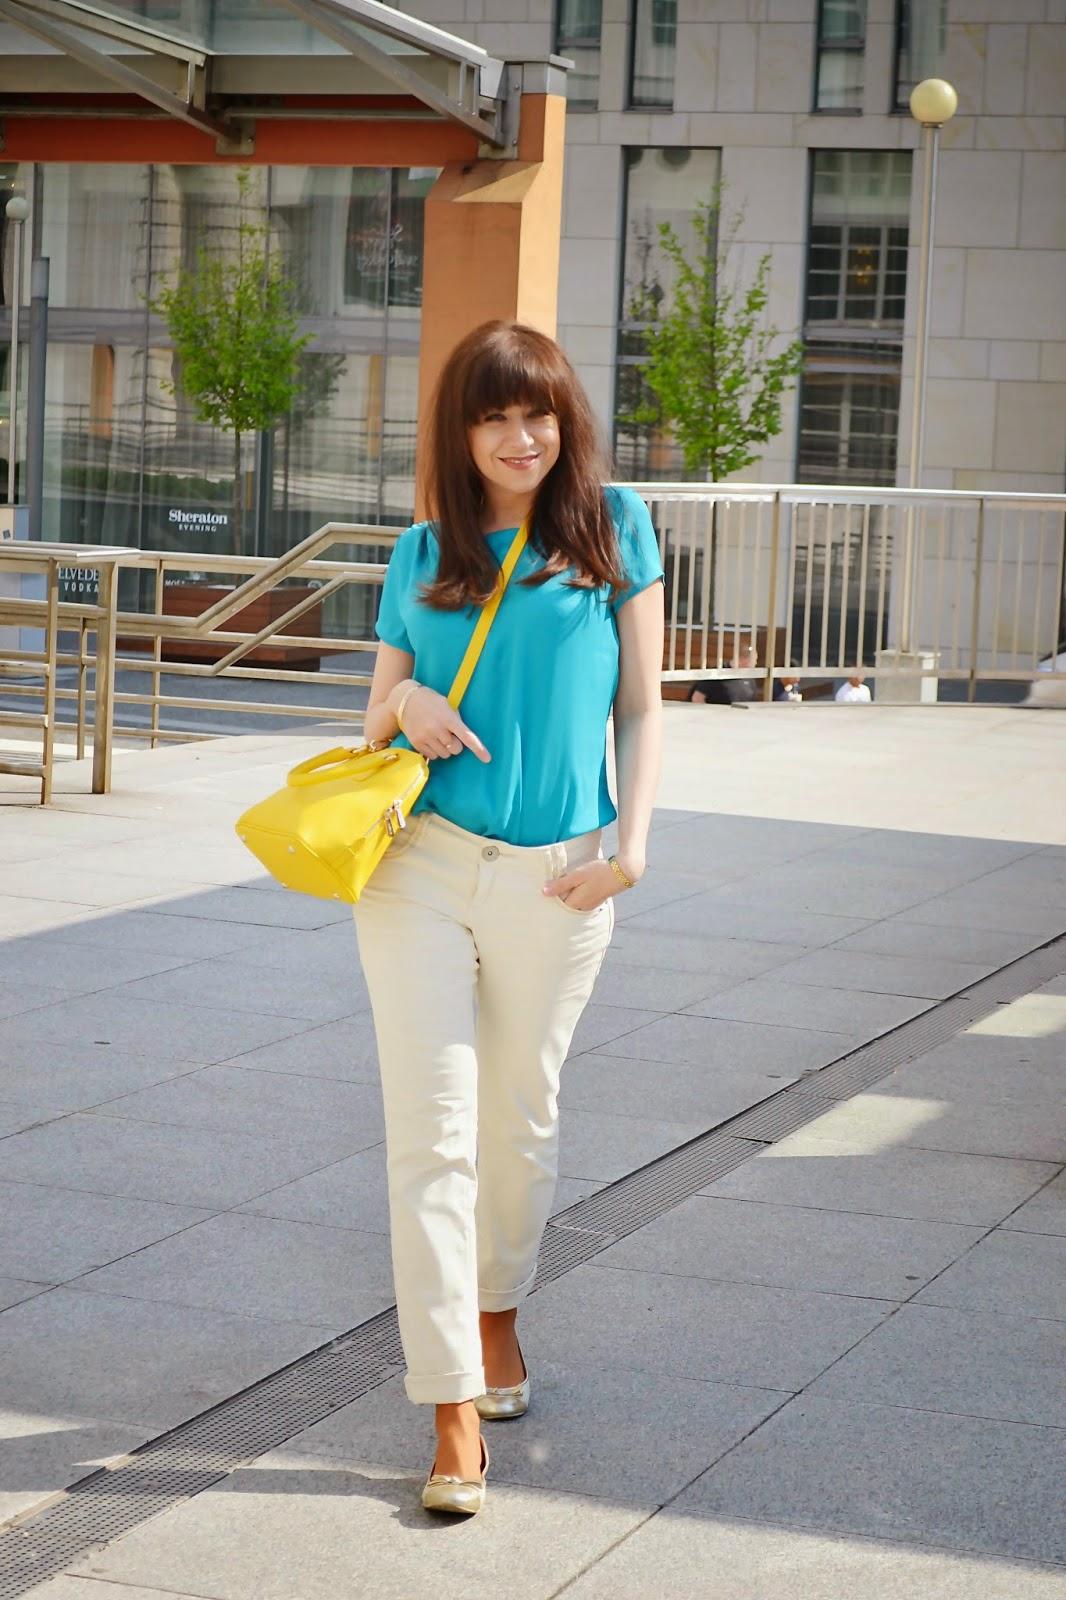 JEJ Katharine-fashion is beautiful